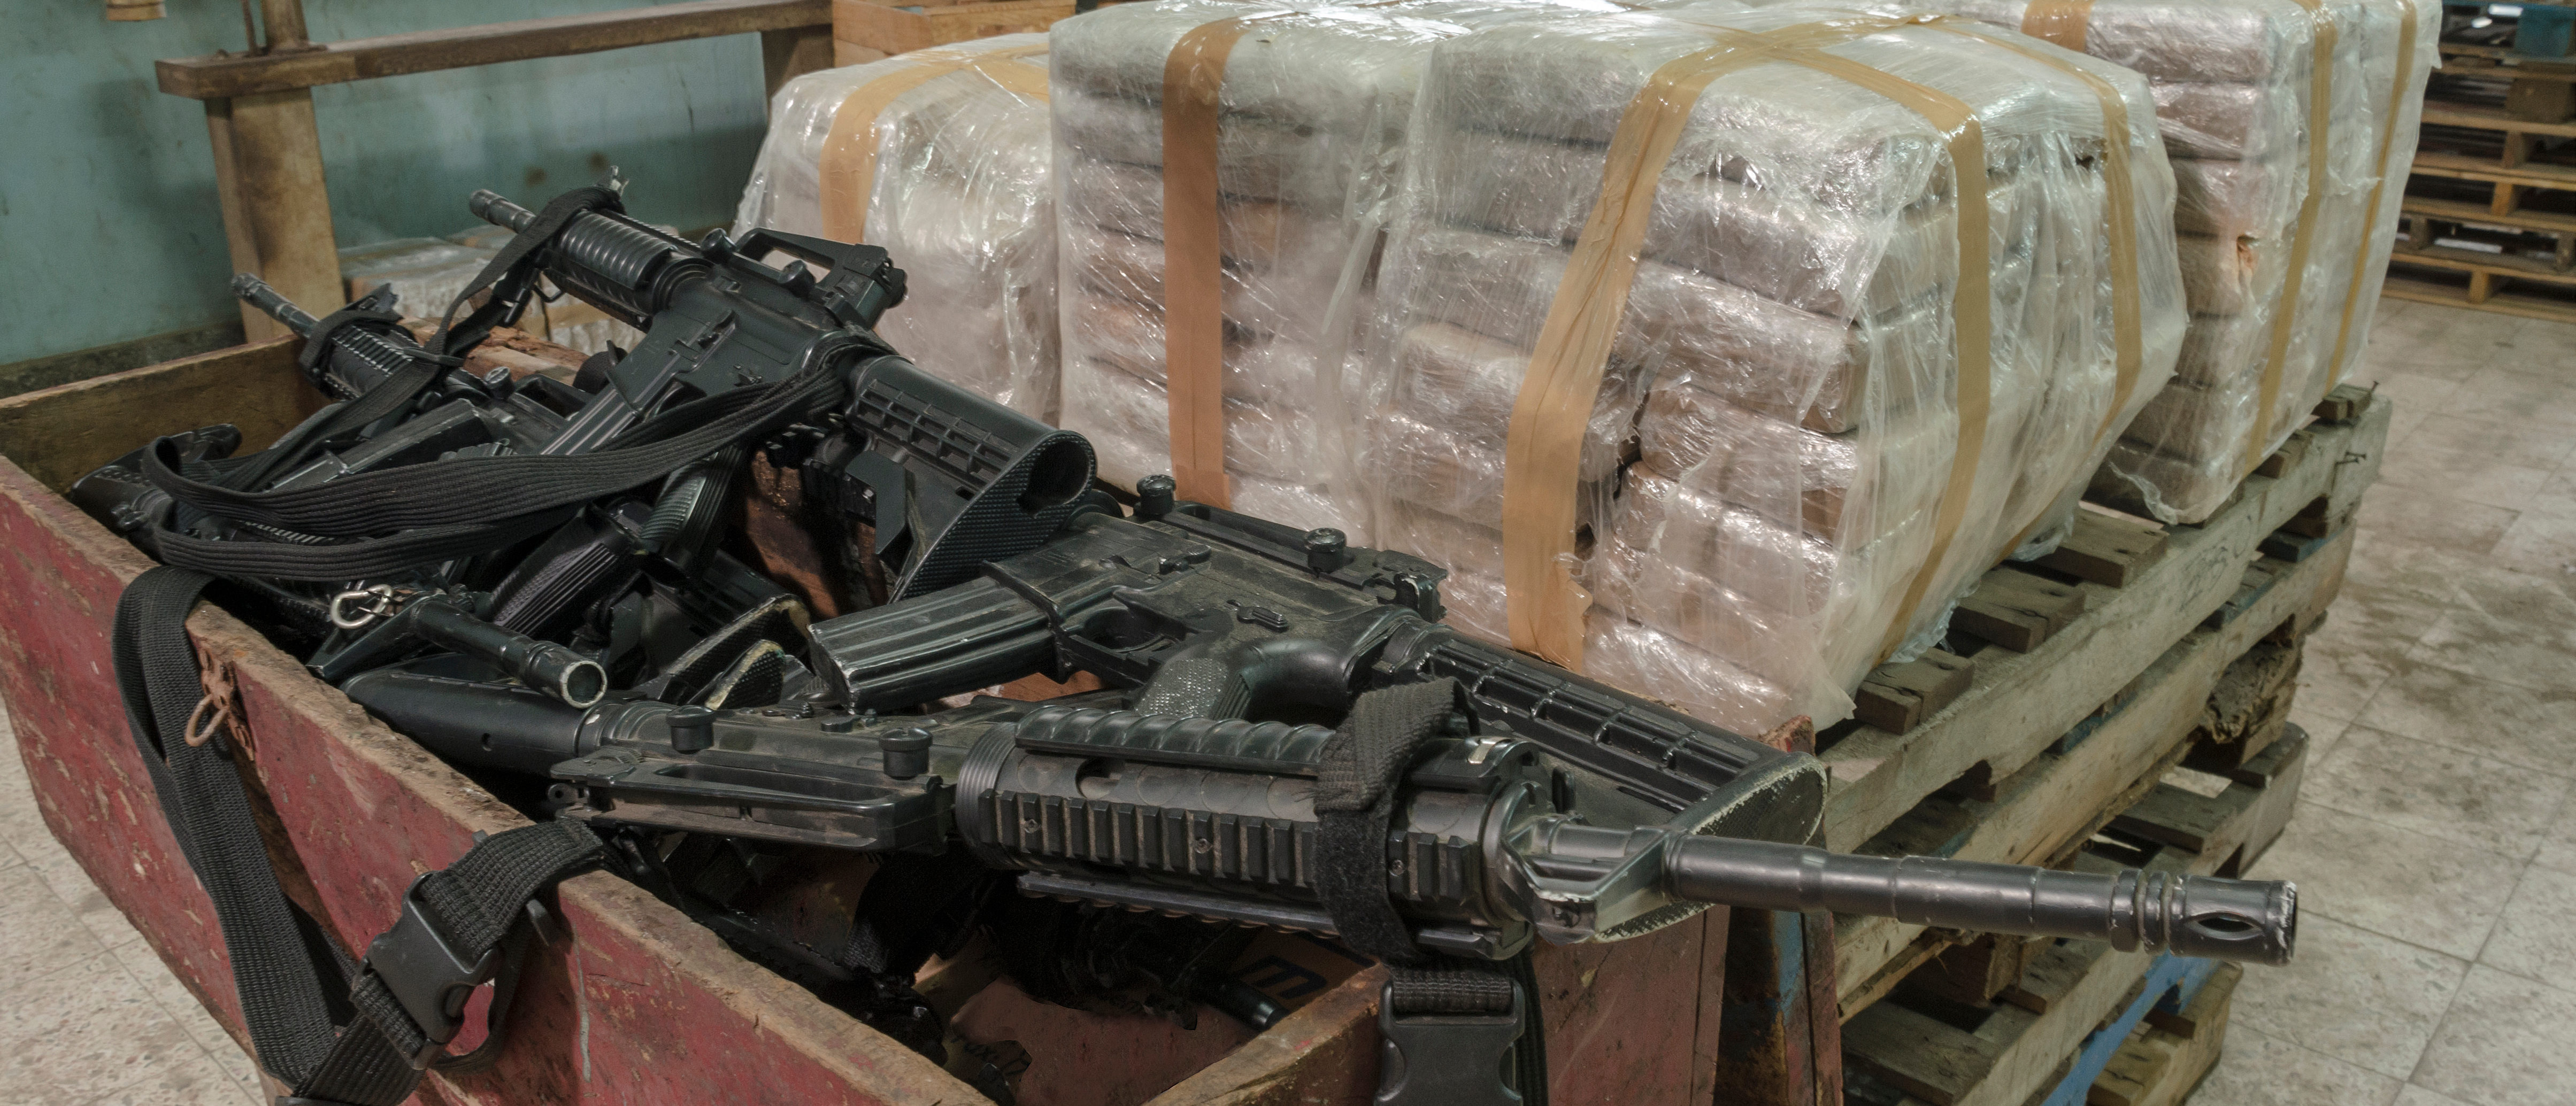 Drugs and guns (Shutterstock/Leon Rafael)